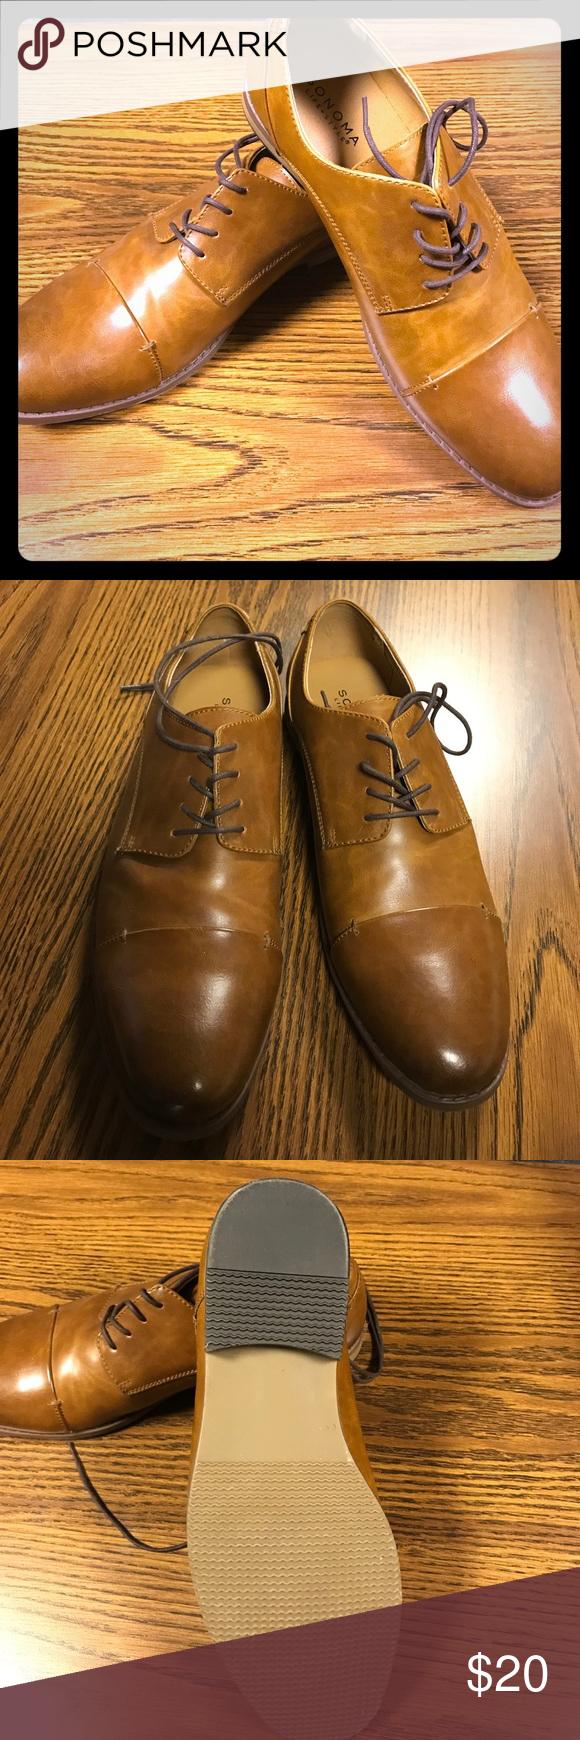 a811ebaac8a SONOMA Brendan Oxford Shoes - Men's 10 1/2 Camel colored casual ...